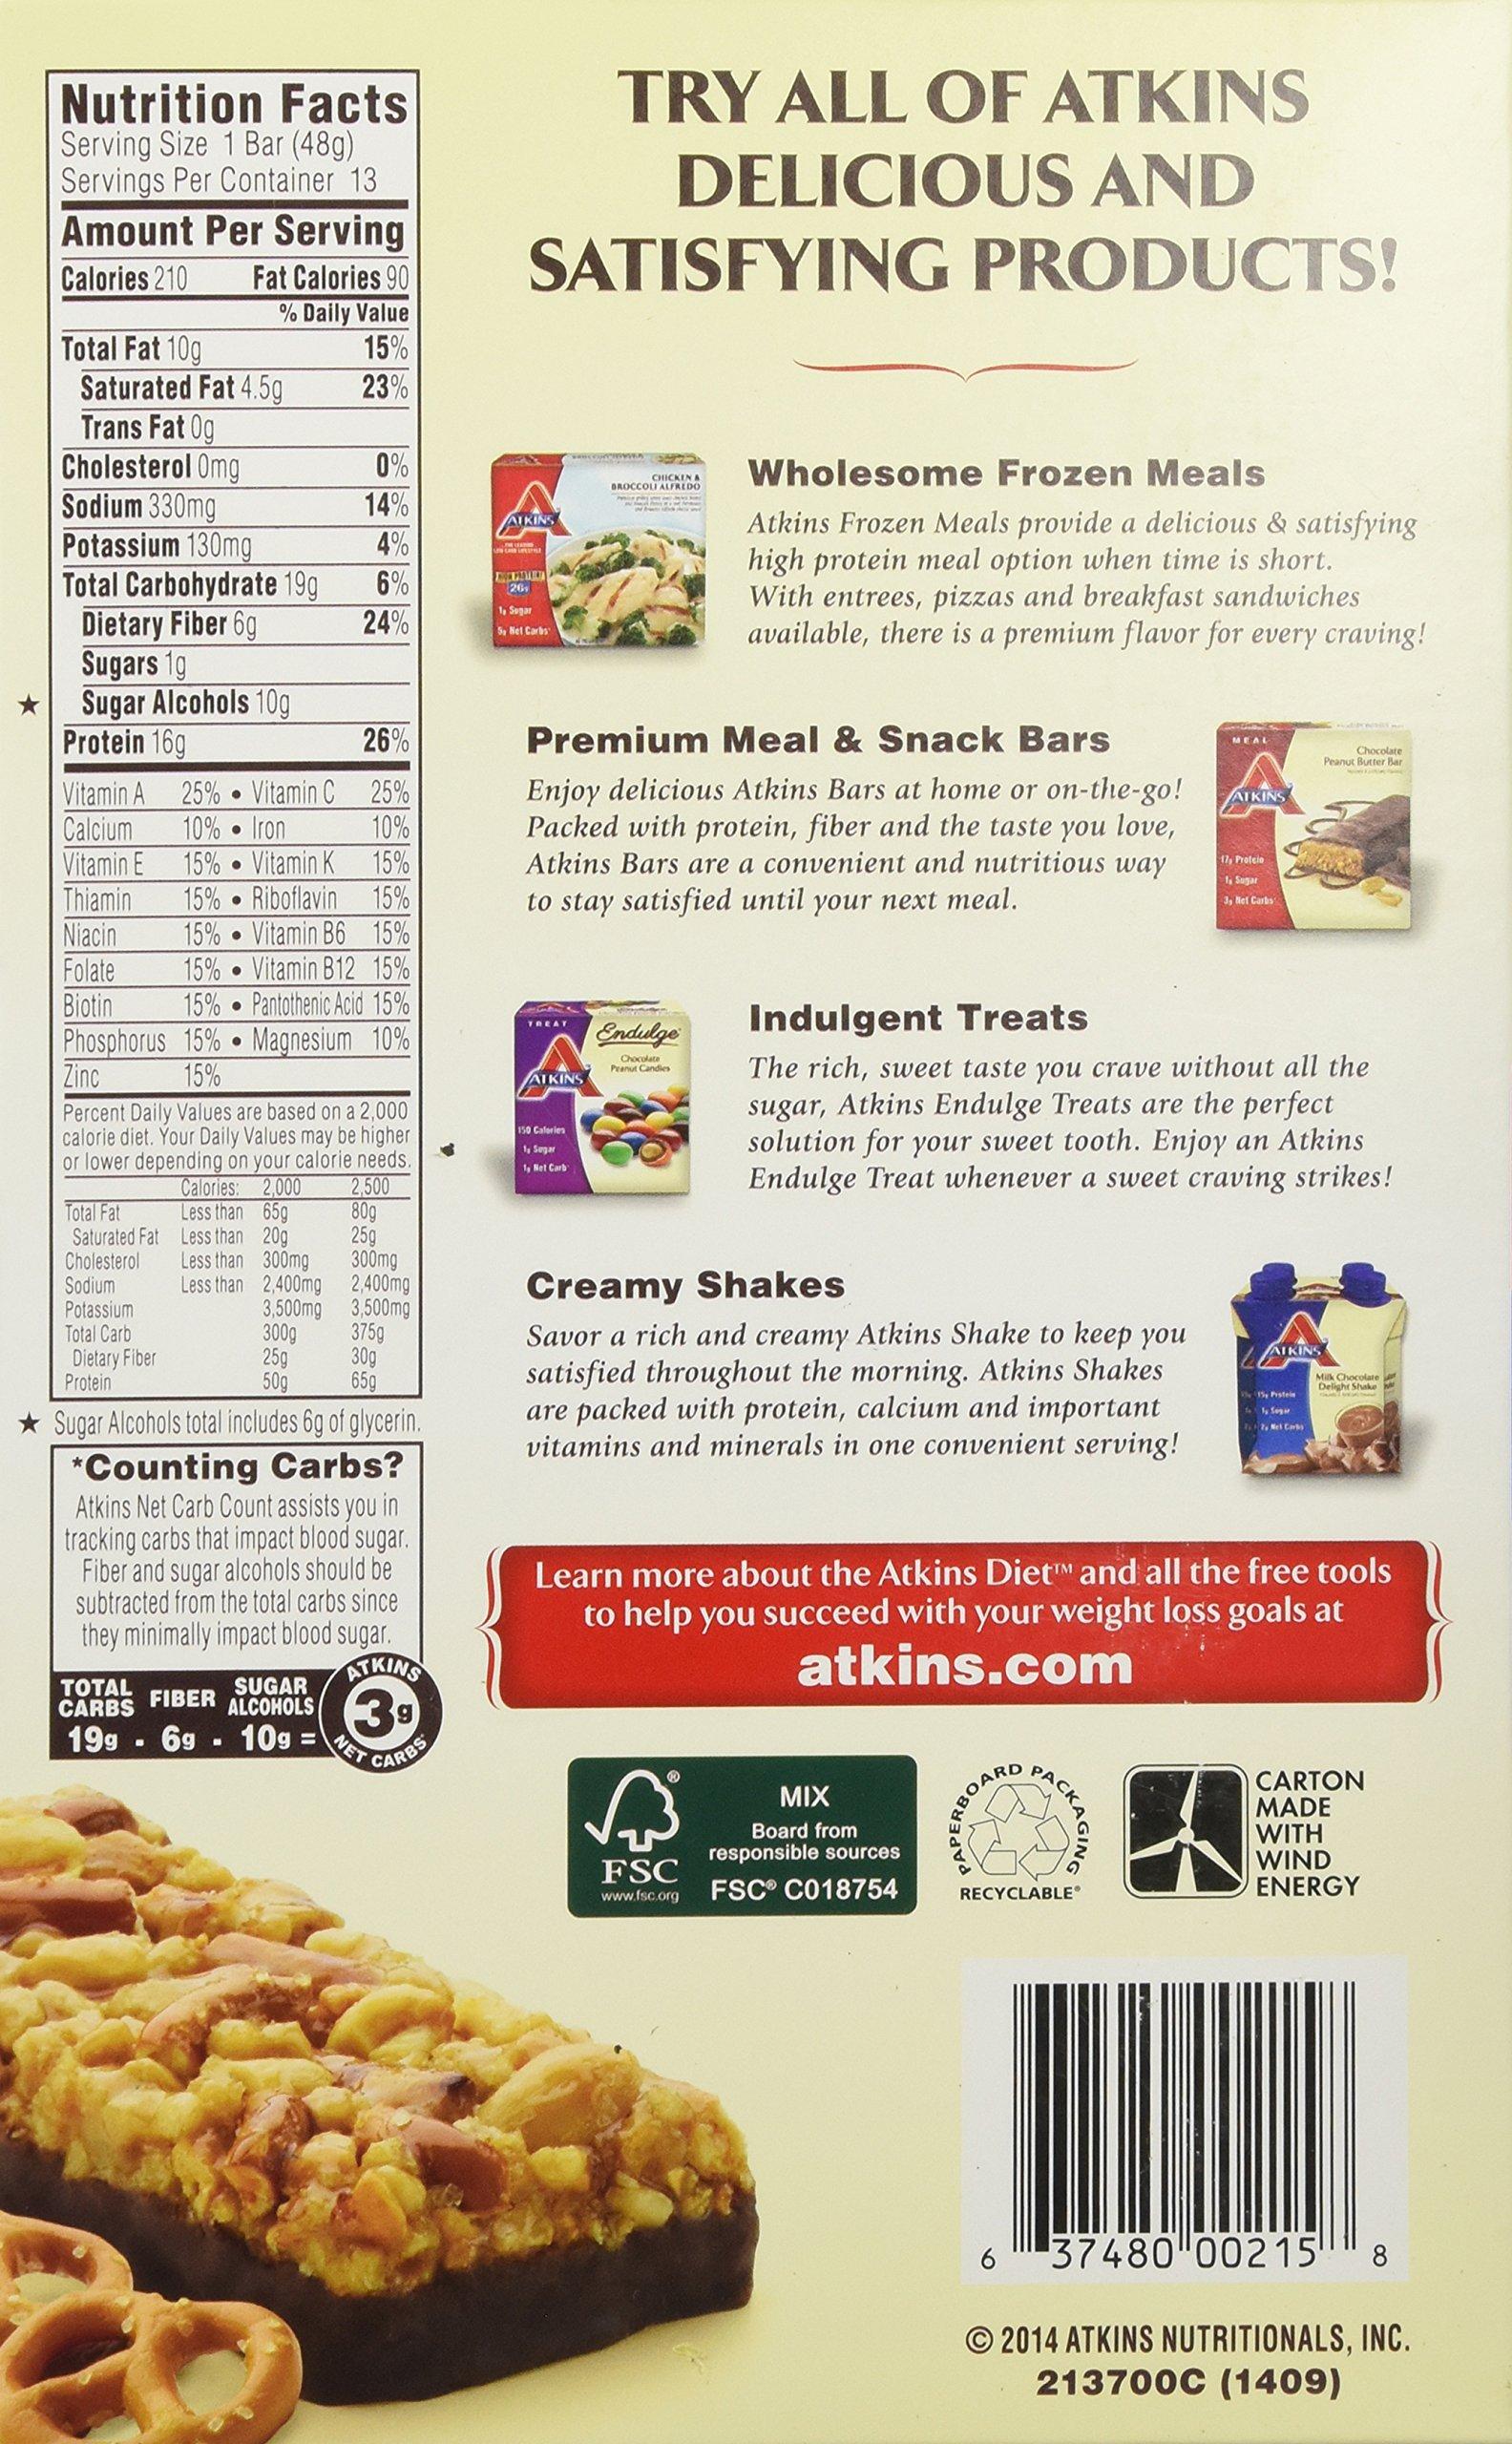 Atkins Chocolate Peanut Butter Pretzel Bar, 13 Count by atkins (Image #5)